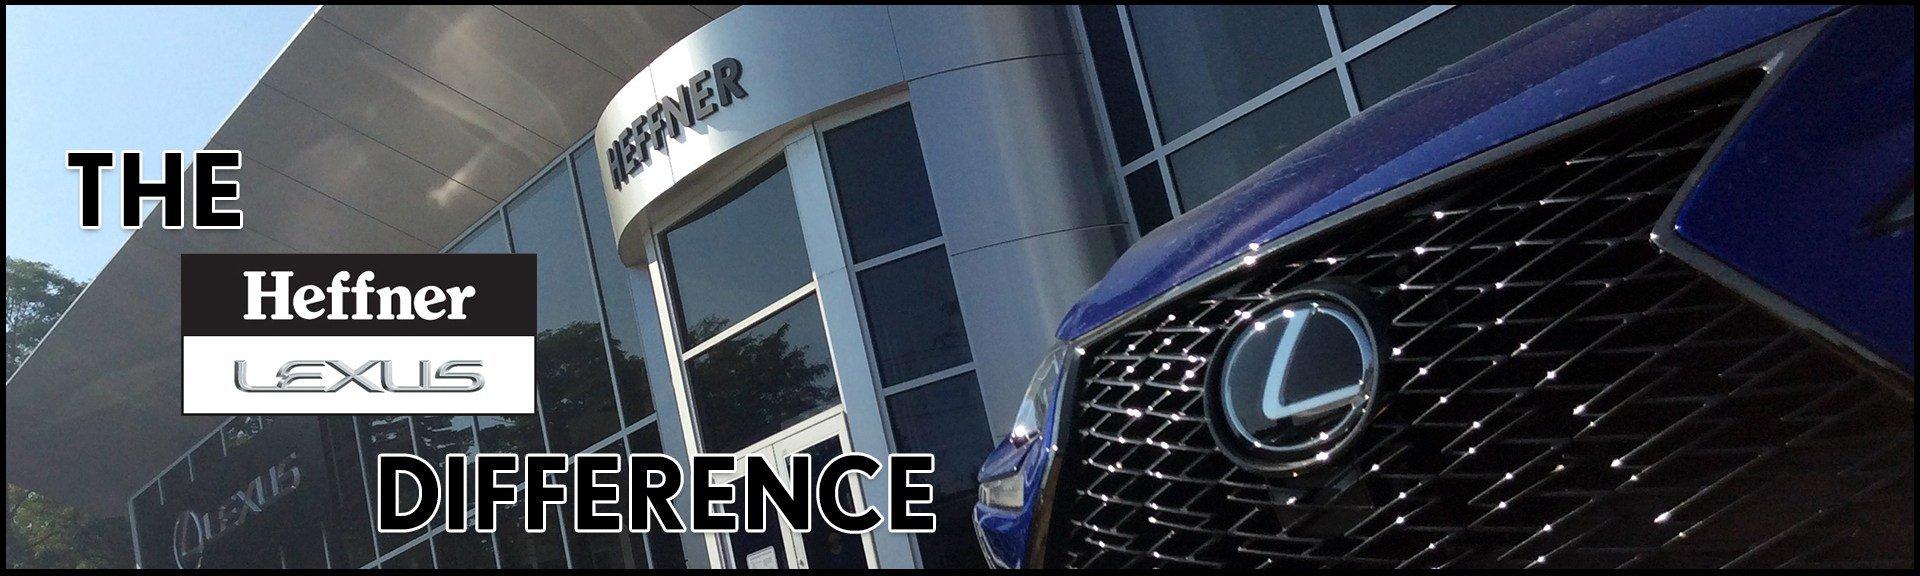 Heffner Difference Banner Ad_Lexus